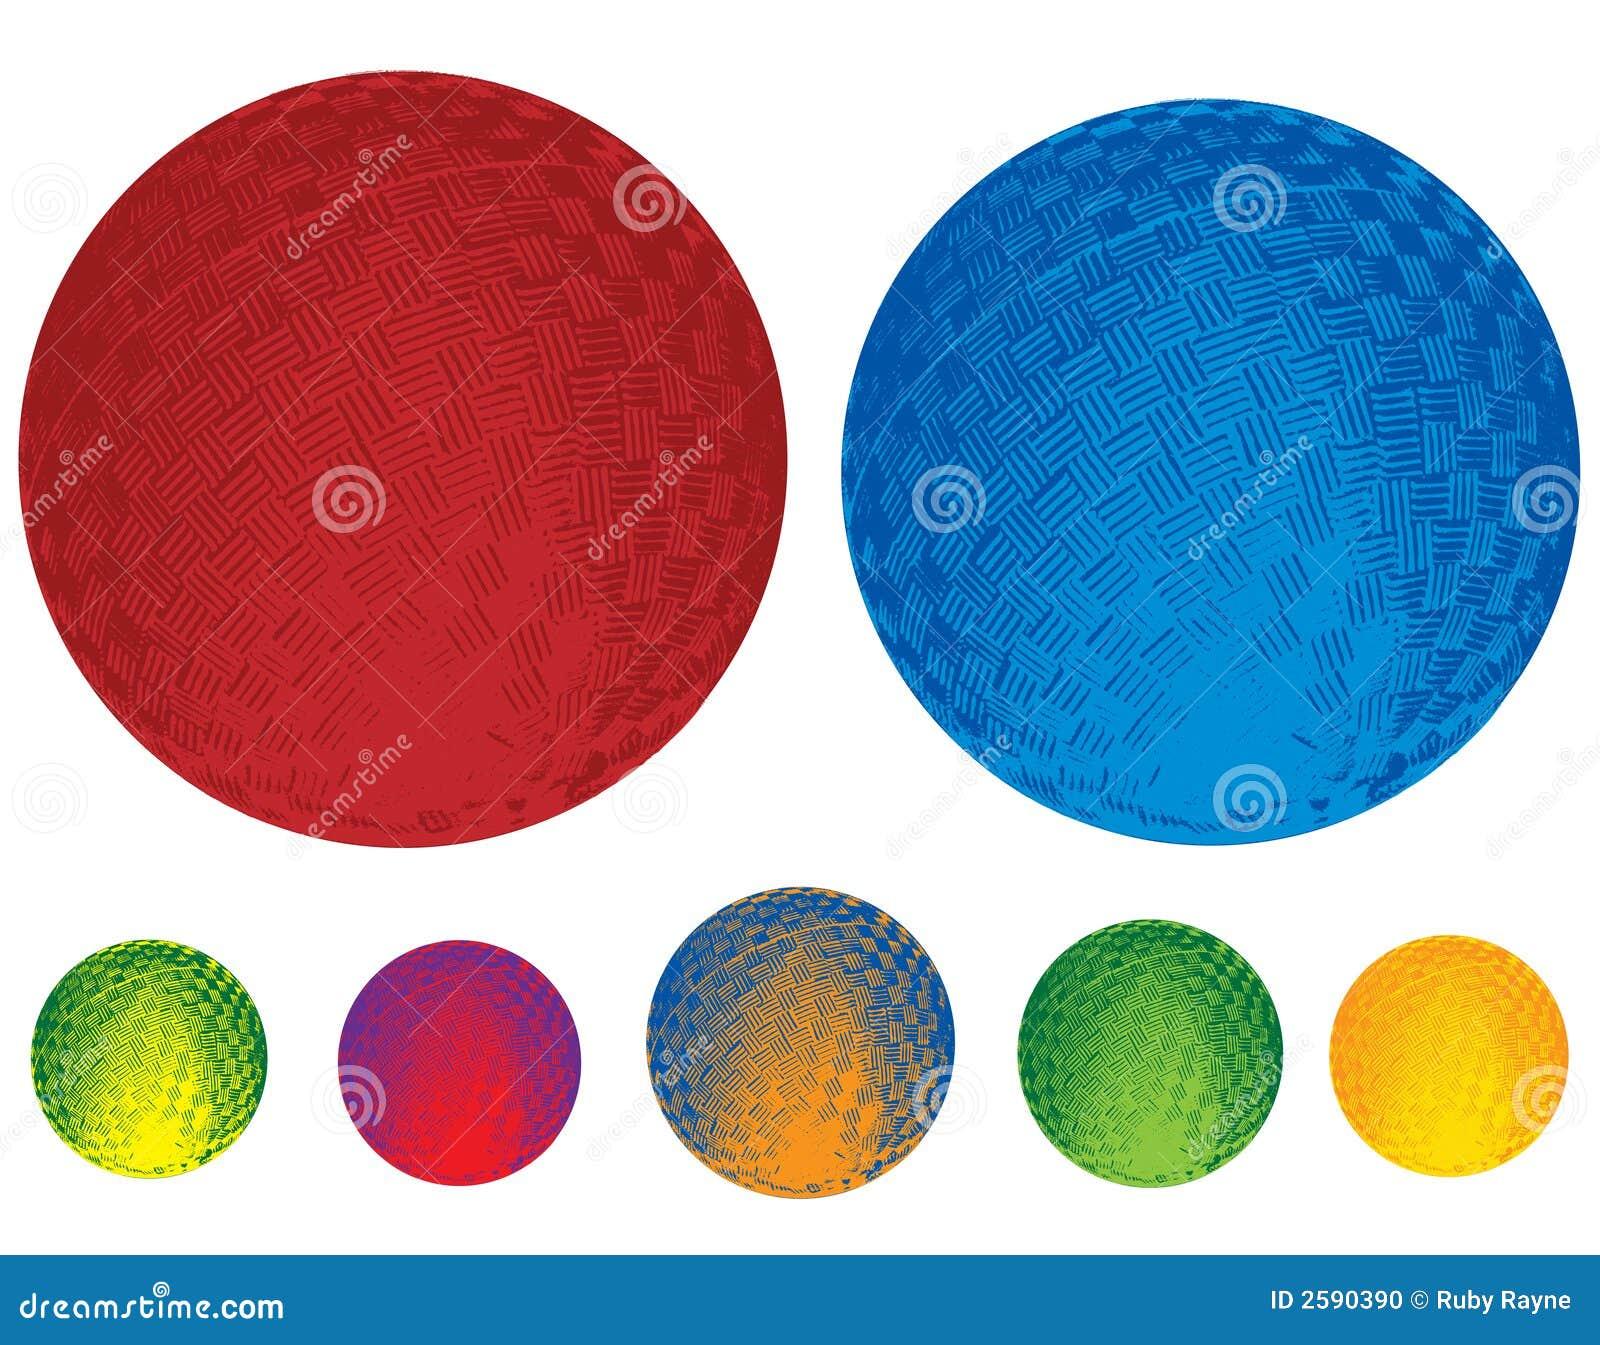 Illustrated Rubber Balls